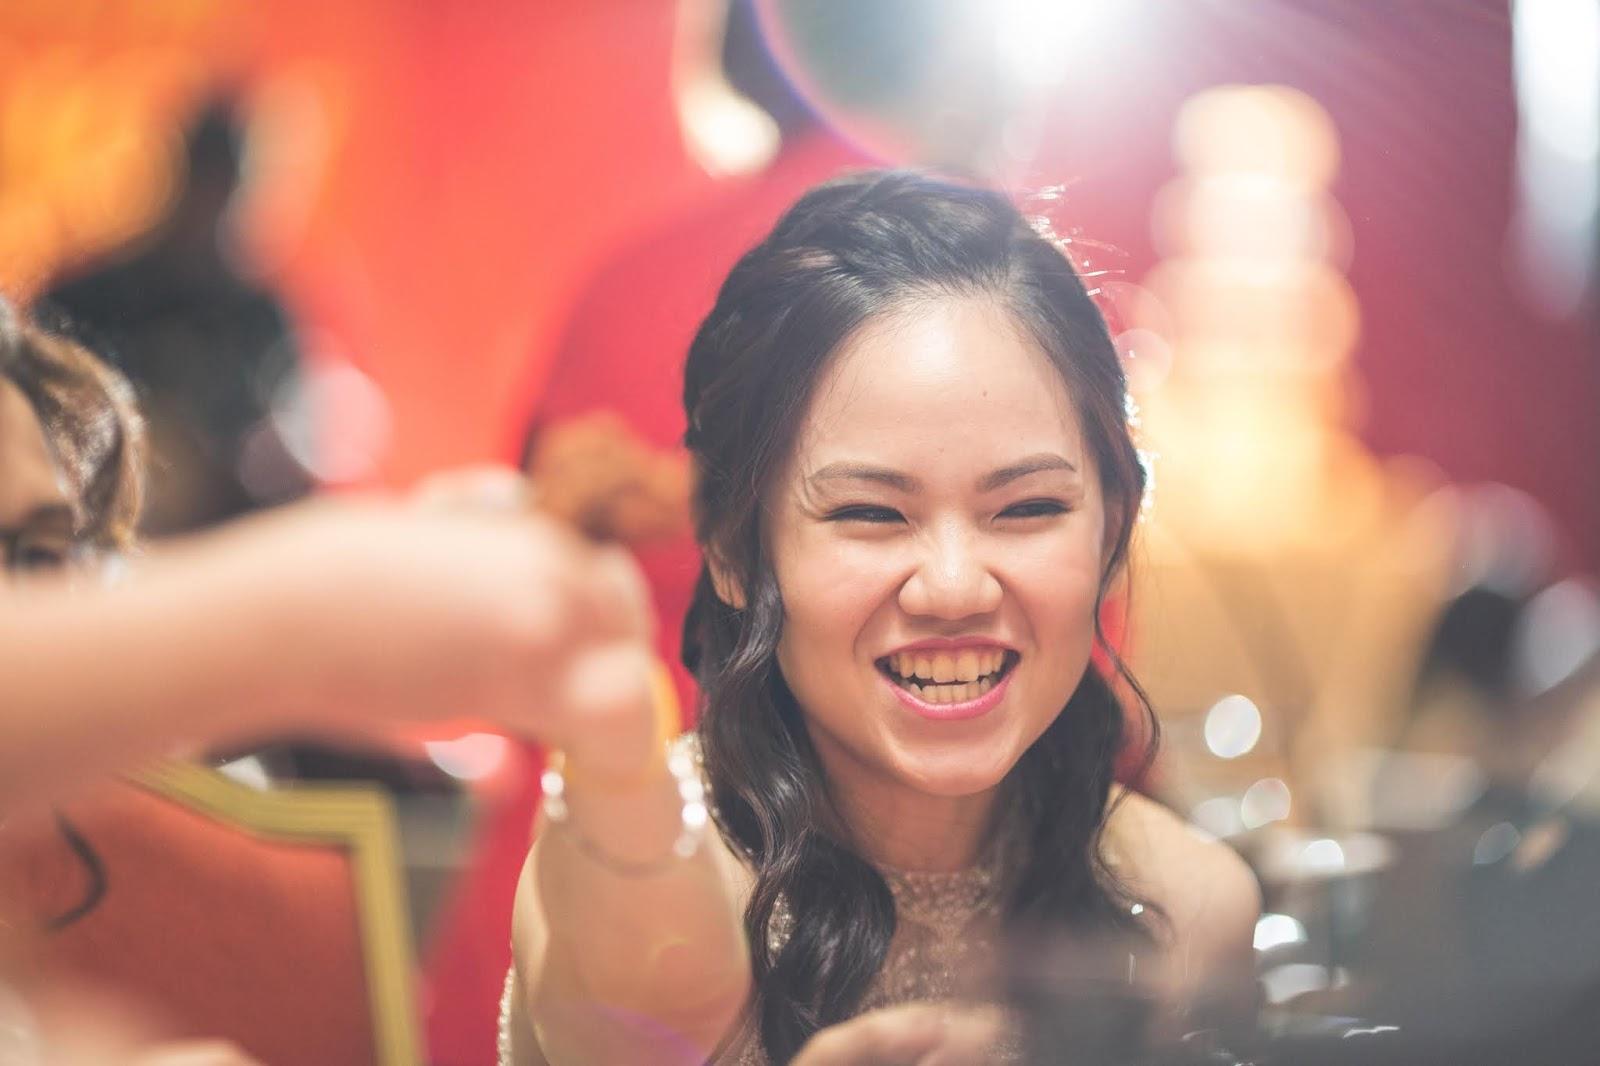 Chinese wedding day photographer penang, chinese wedding photographer in butterworth, chinese wedding photography , penang wedding photographer, malaysia wedding photographer,bridal photography butterworth, bridal photographer penang